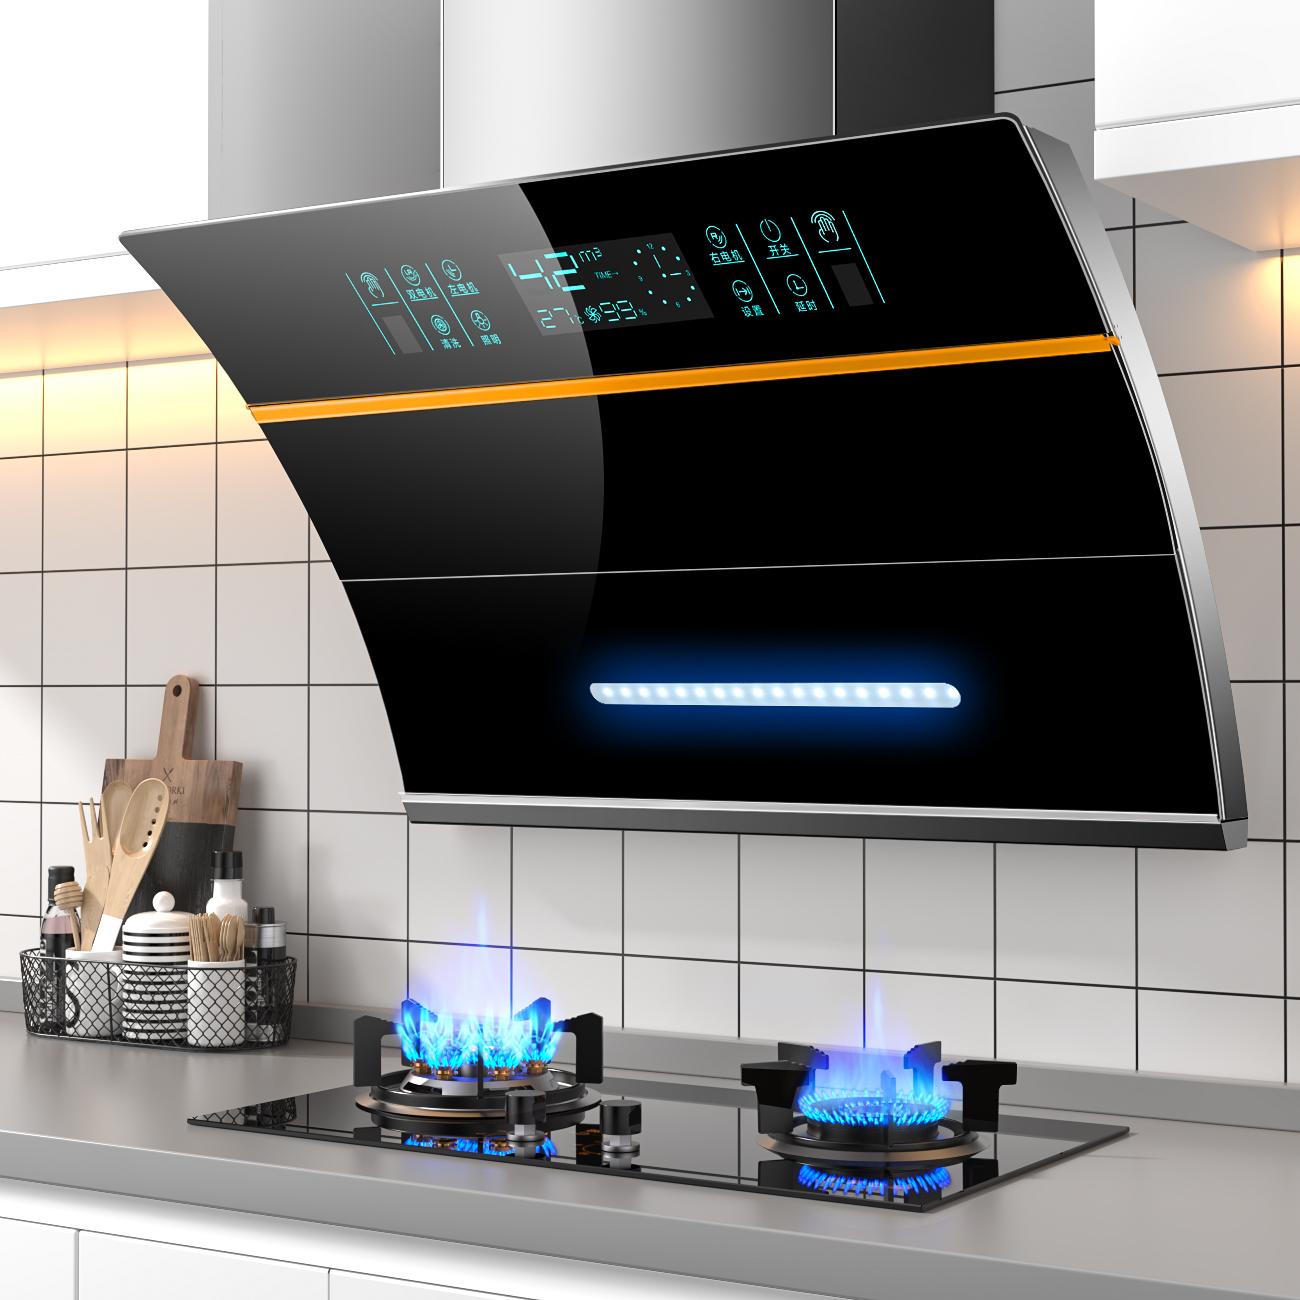 Good wife range hood gas stove package side suction smoke stove Consumer home kitchen smoke machine stove set combination